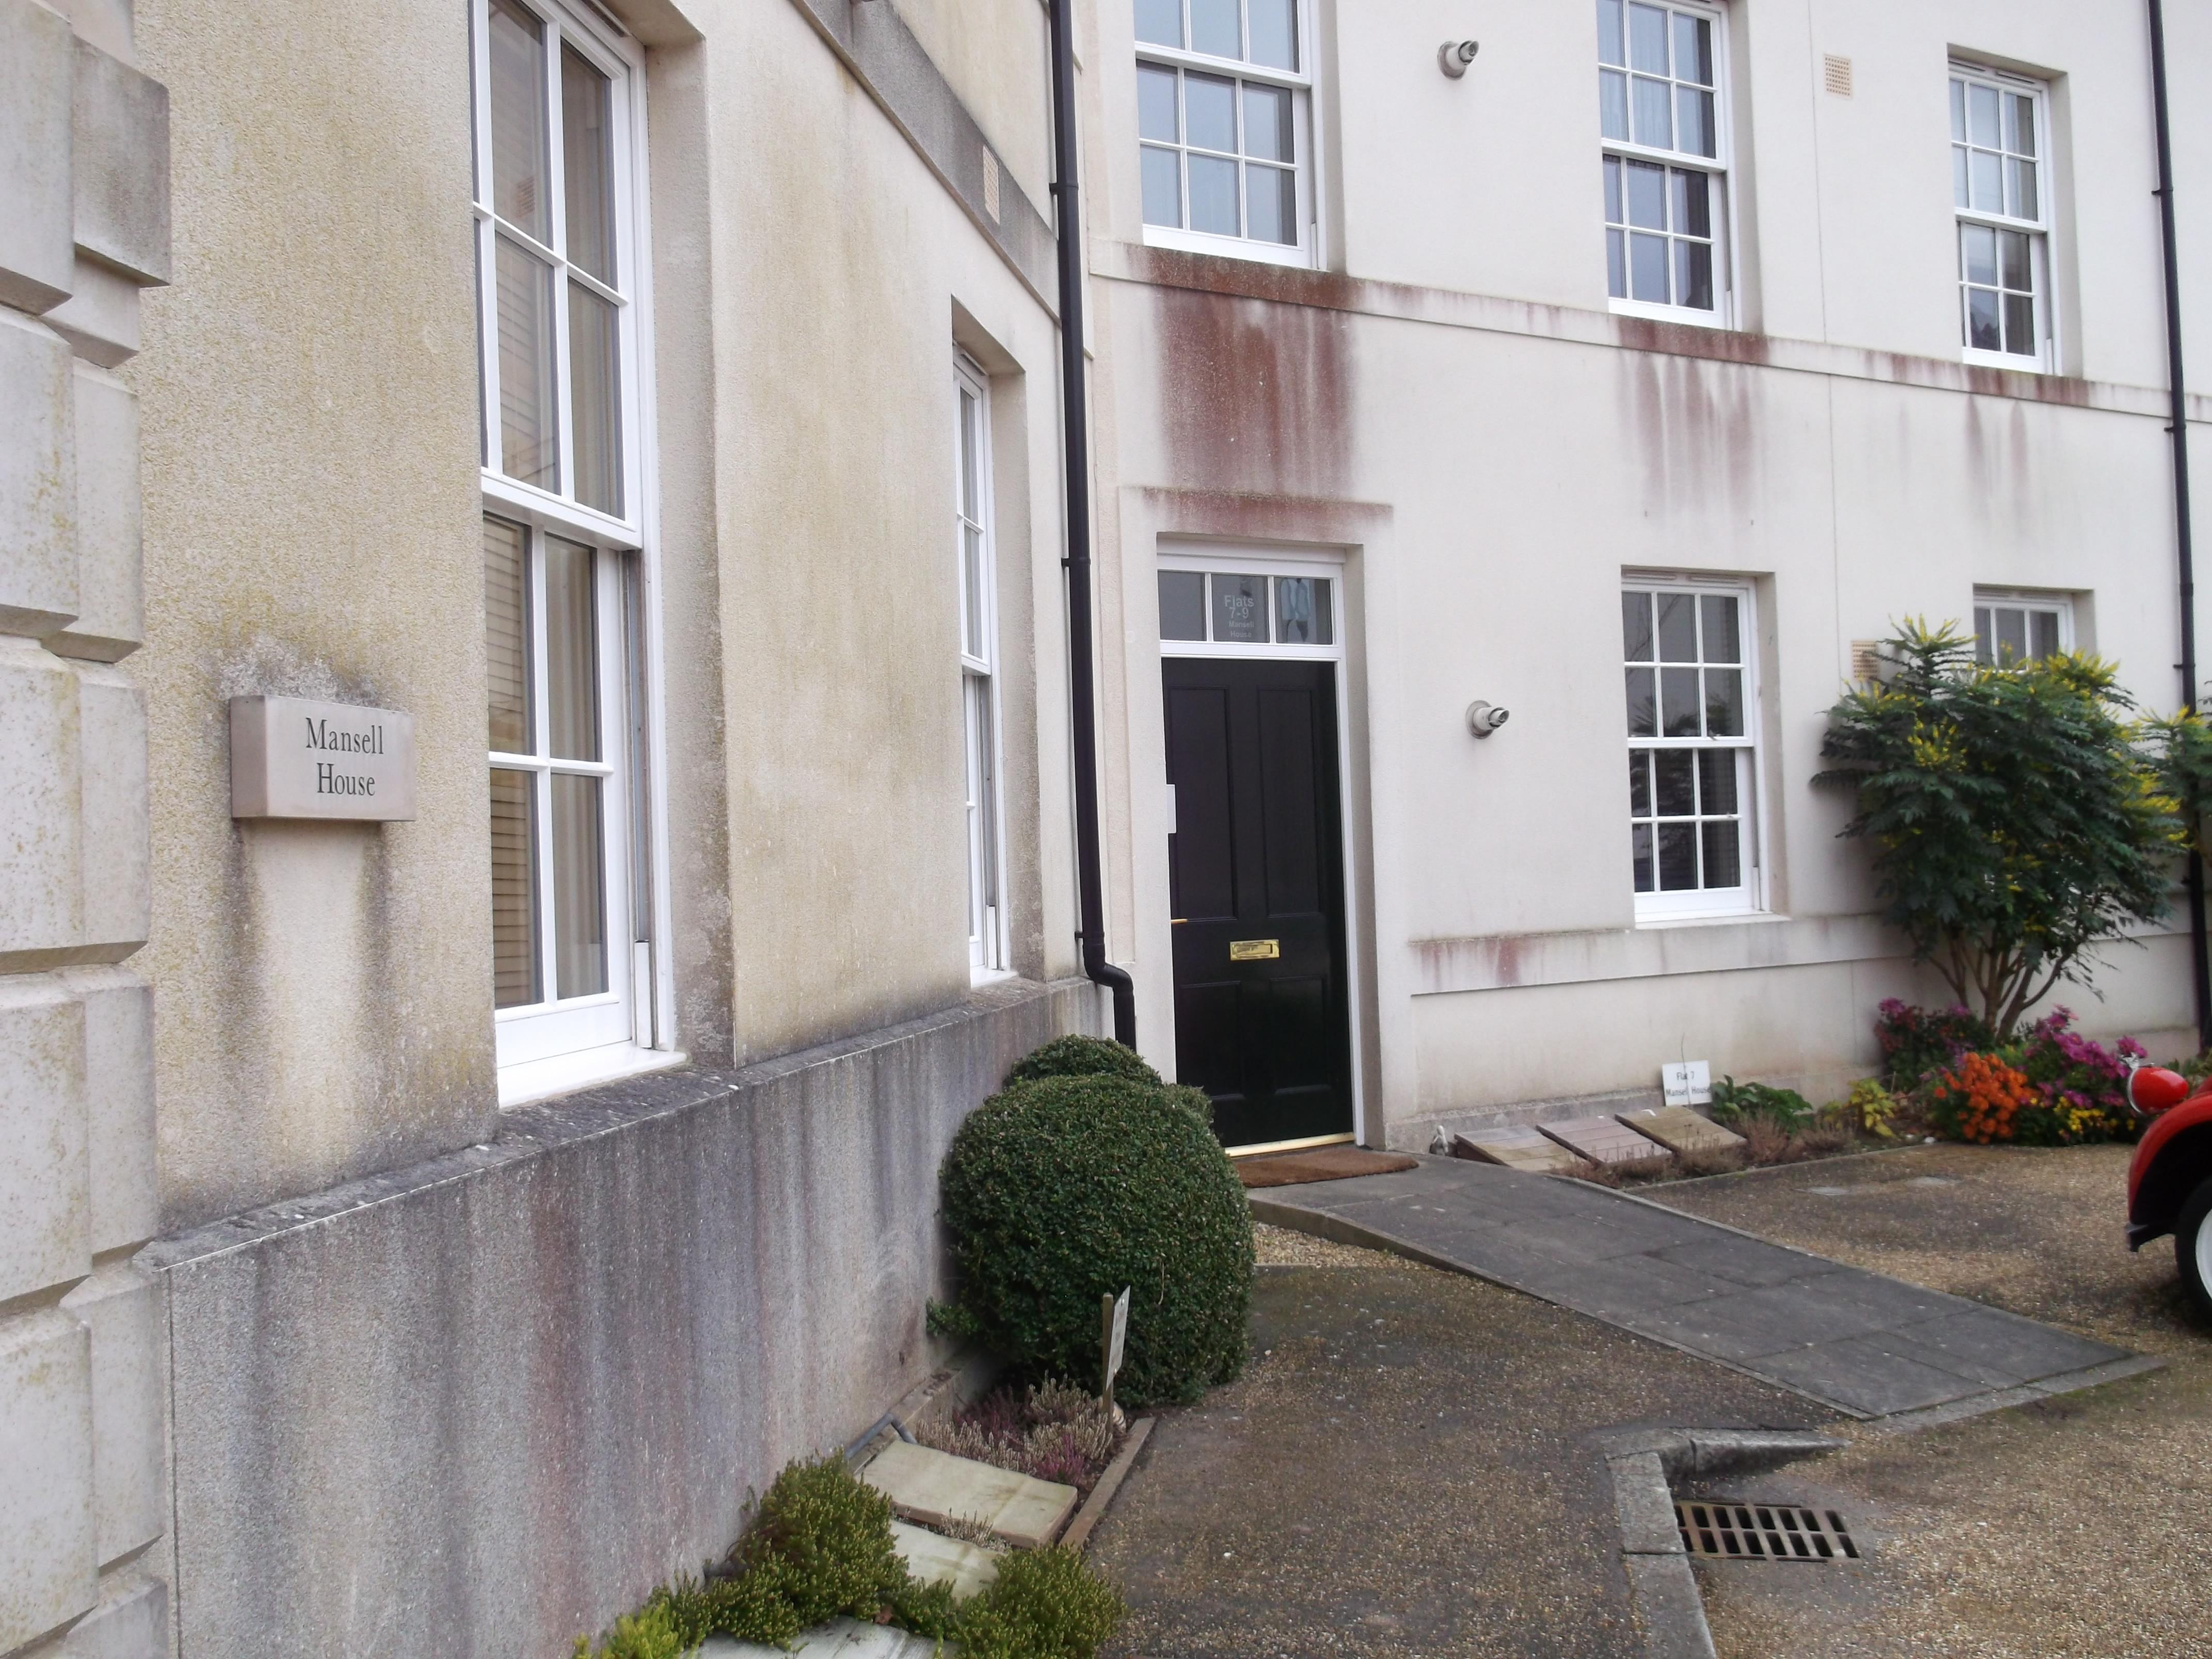 Mansell House, Poundbury, Dorchester DT1 3TS